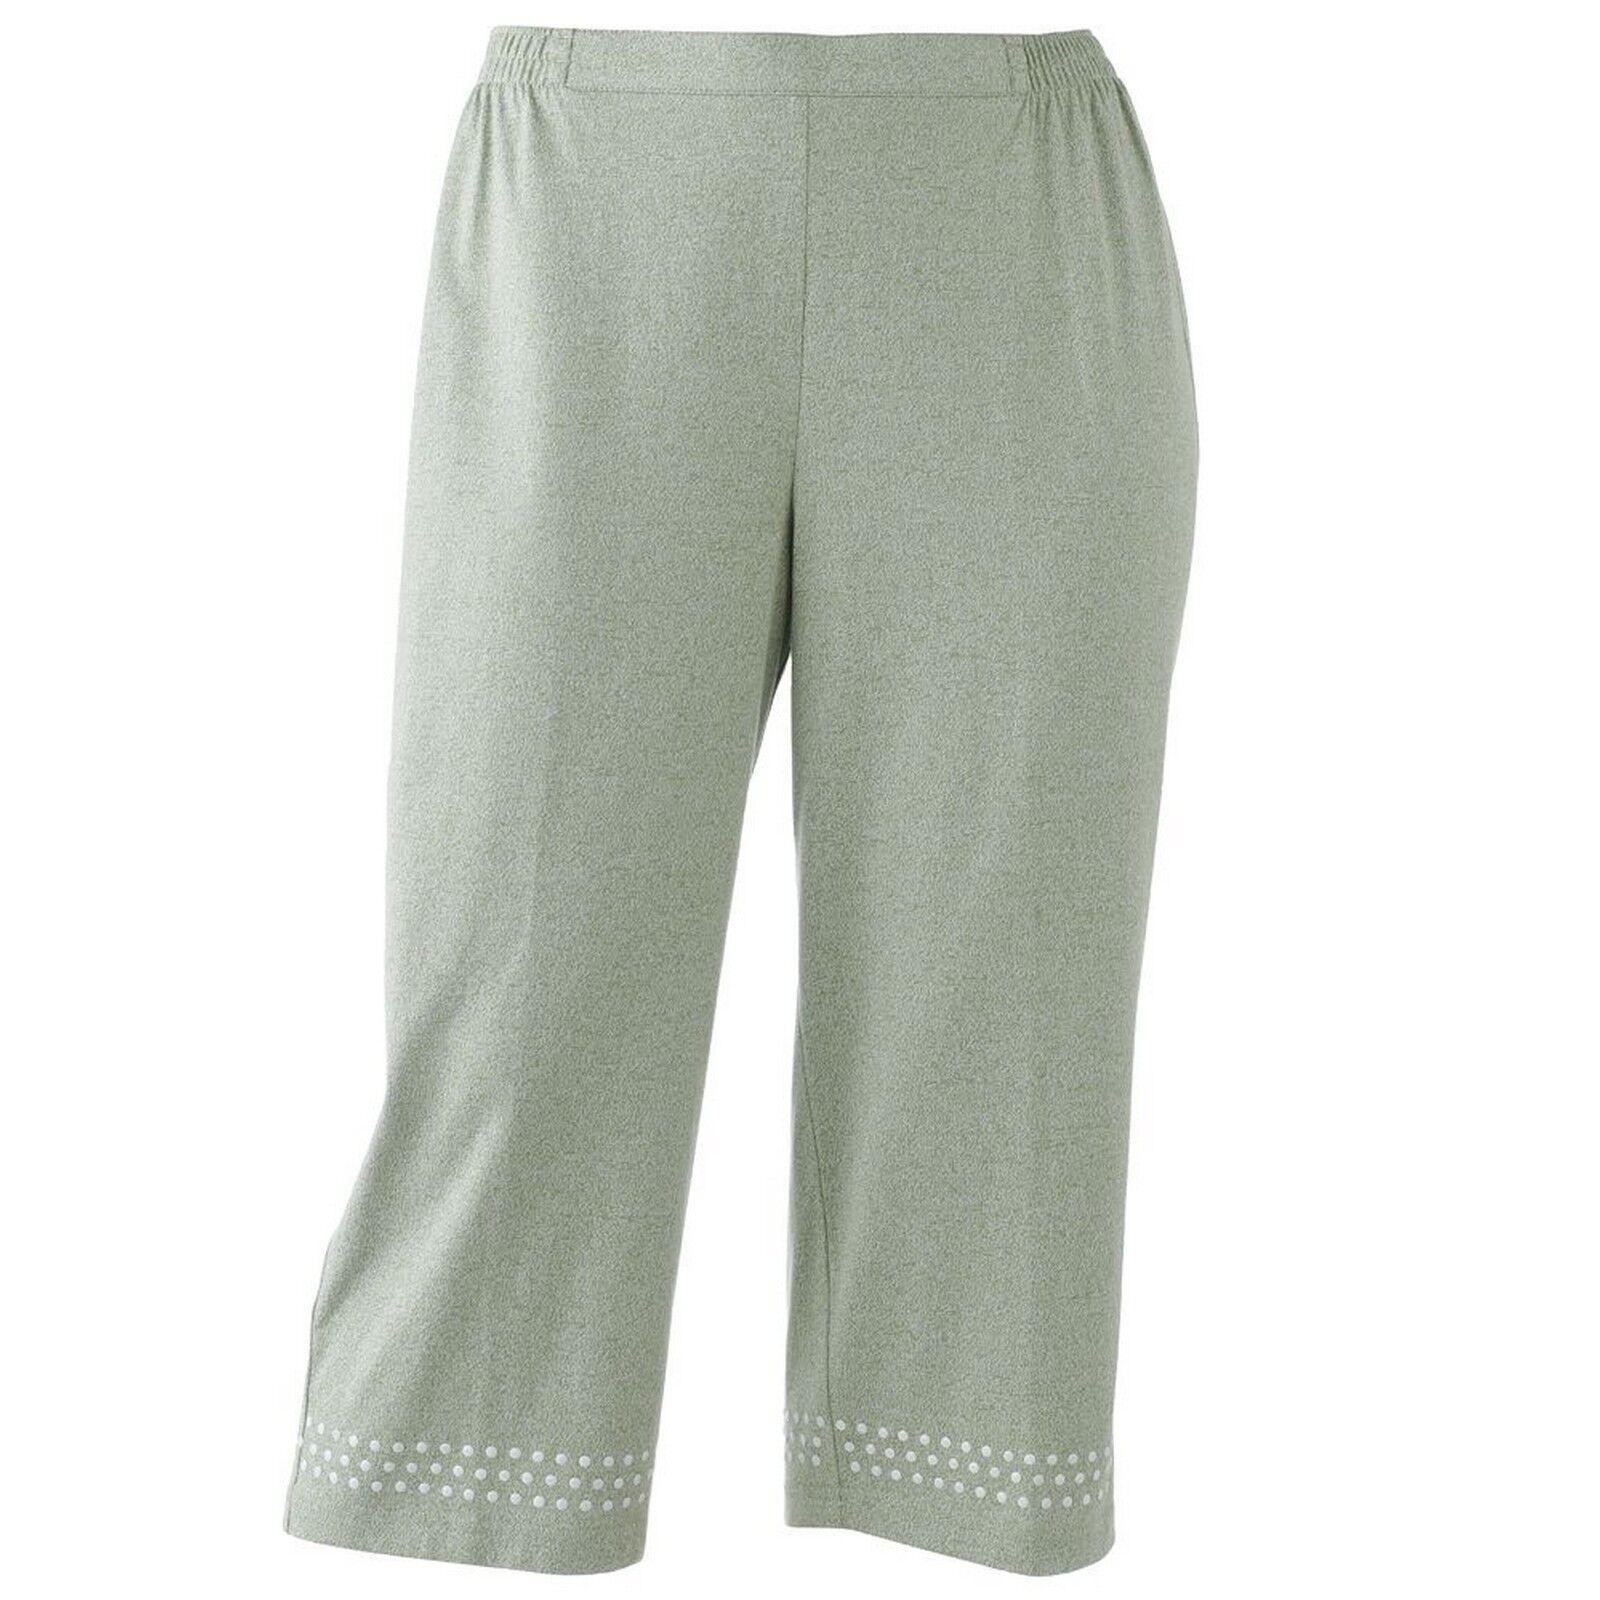 c65f27179b6 Women s Cathy Daniels Pull on Capri Pants Neutral Sage Plus Size 2x ...